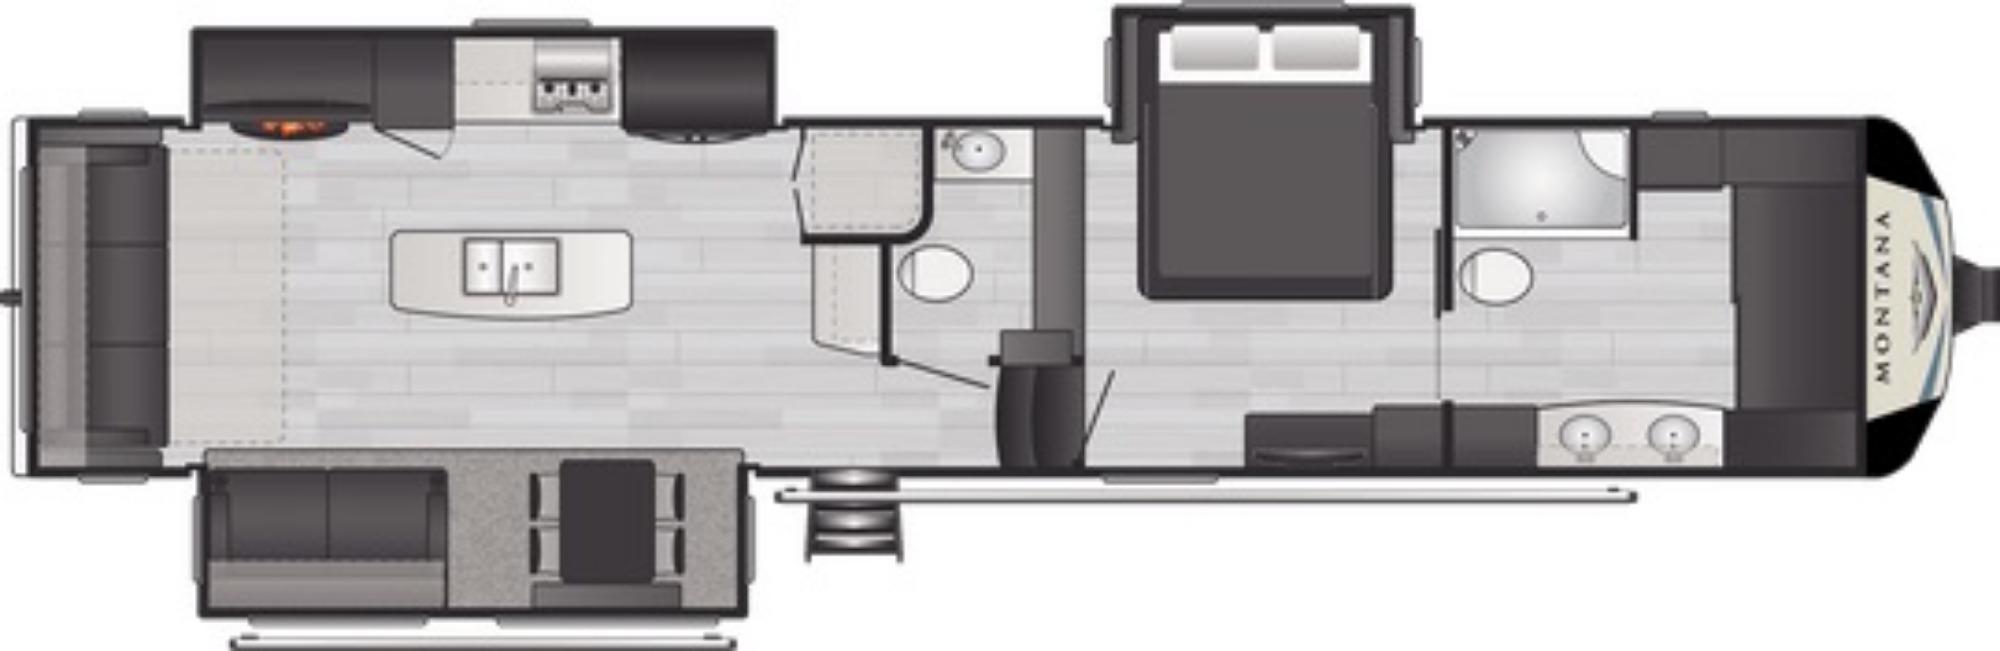 View Floor Plan for 2021 KEYSTONE MONTANA 3930FB